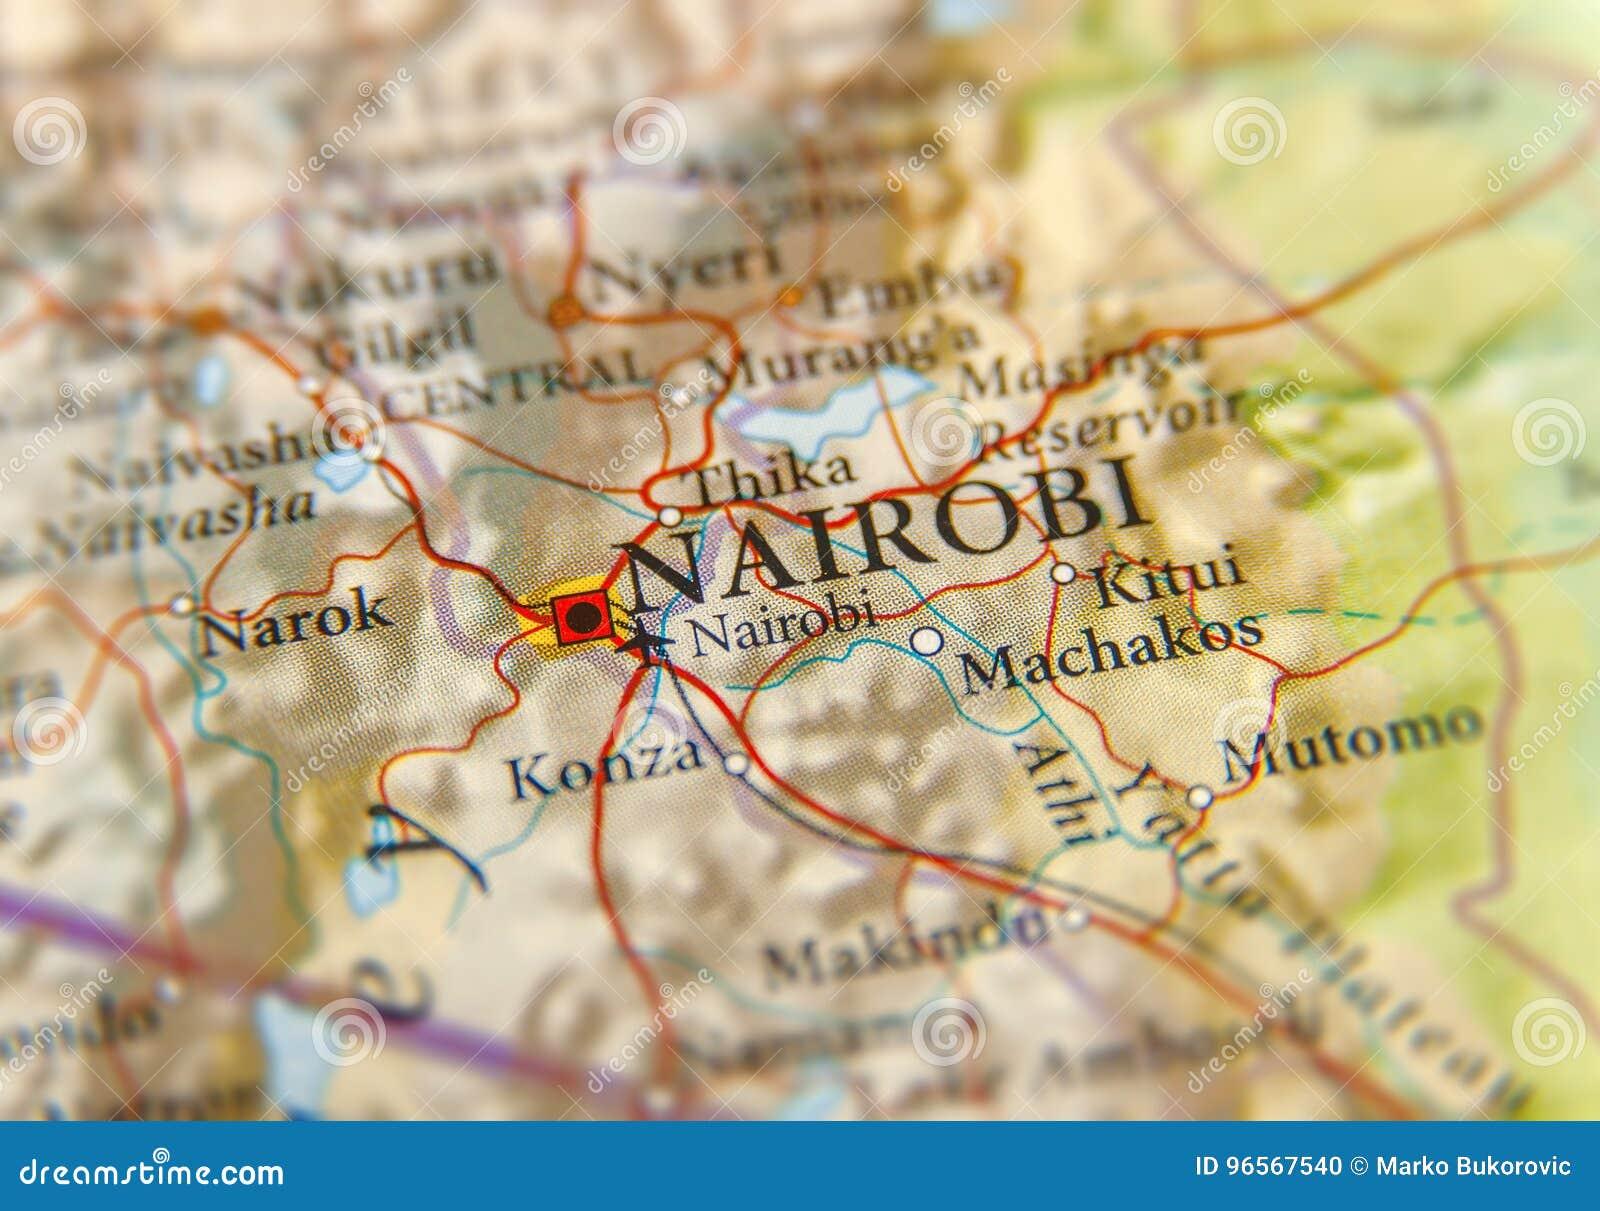 Geographic Map Of Kenya With Capital City Nairobi Stock Photo ...